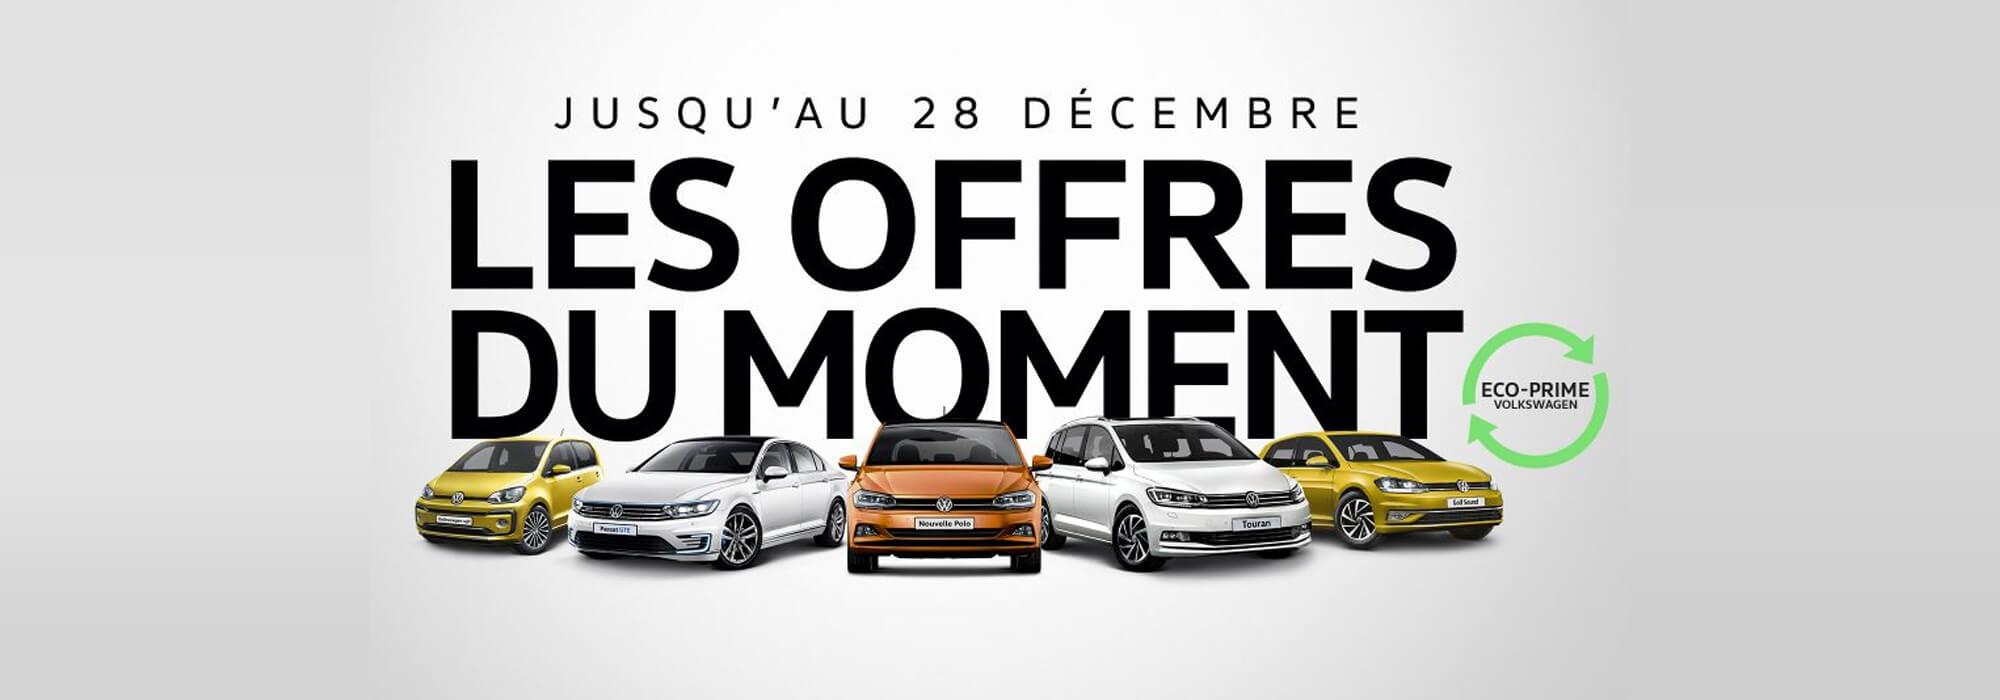 Concession Volkswagen Salon De Provence Volkswagen